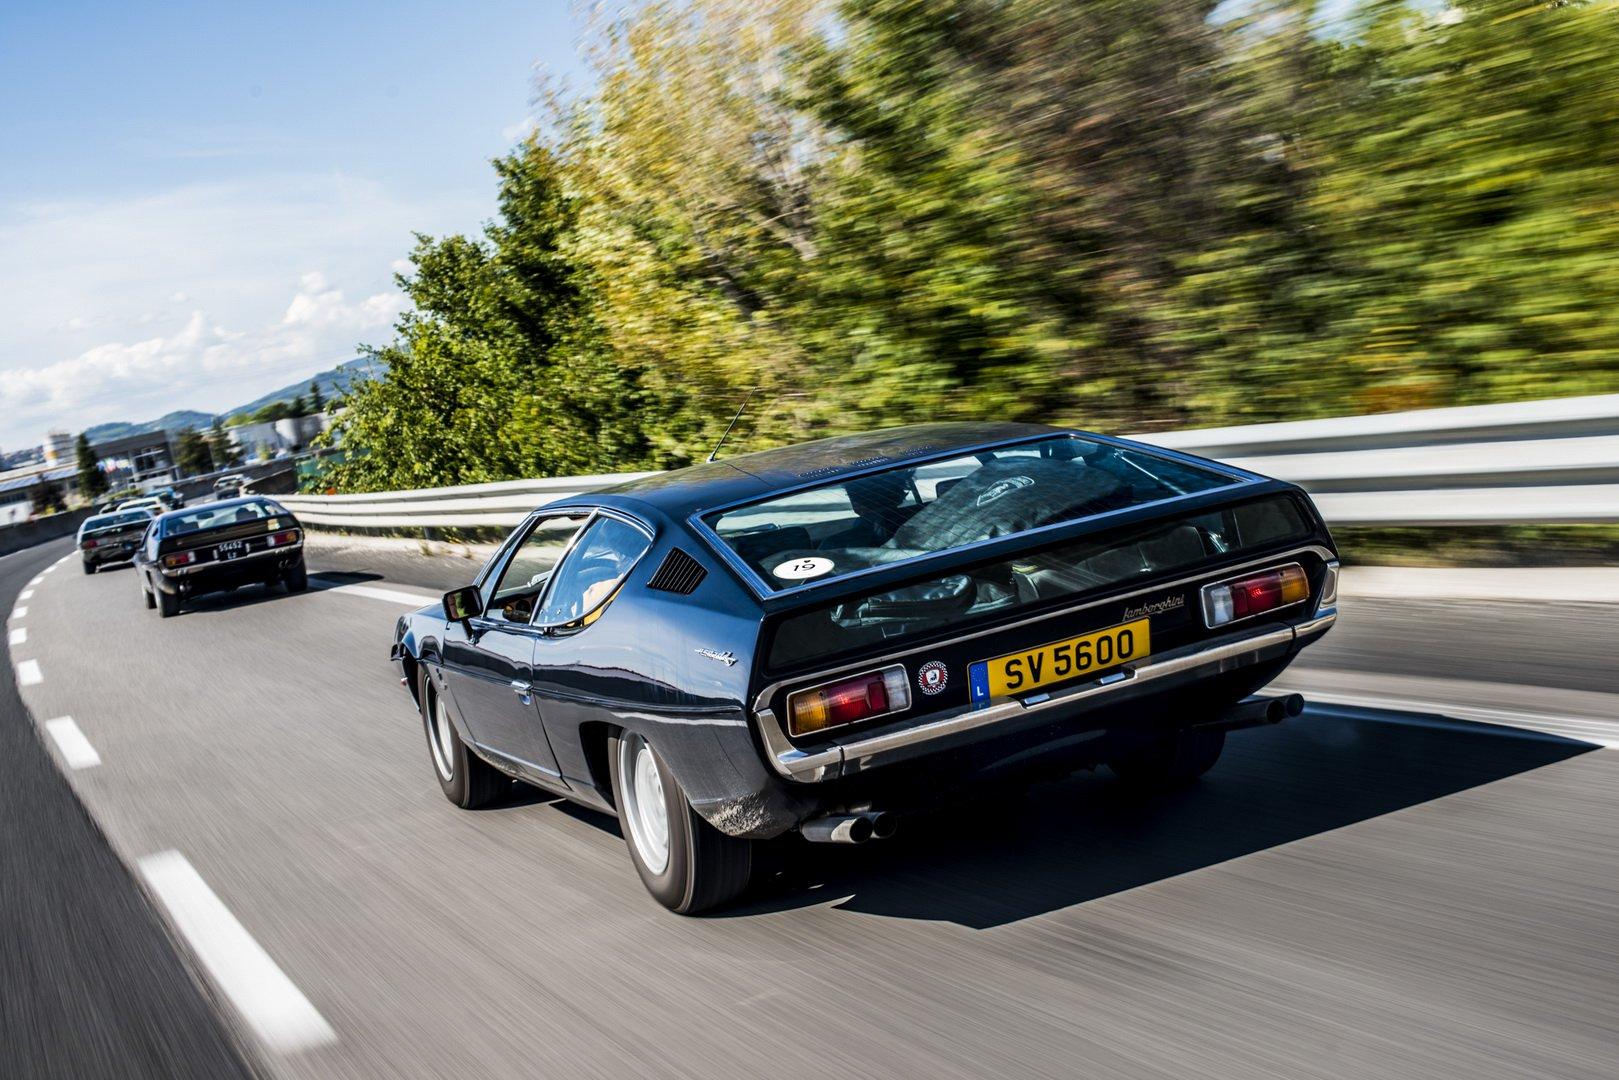 Lamborghini Islero and Espada 50th anniversary (12)